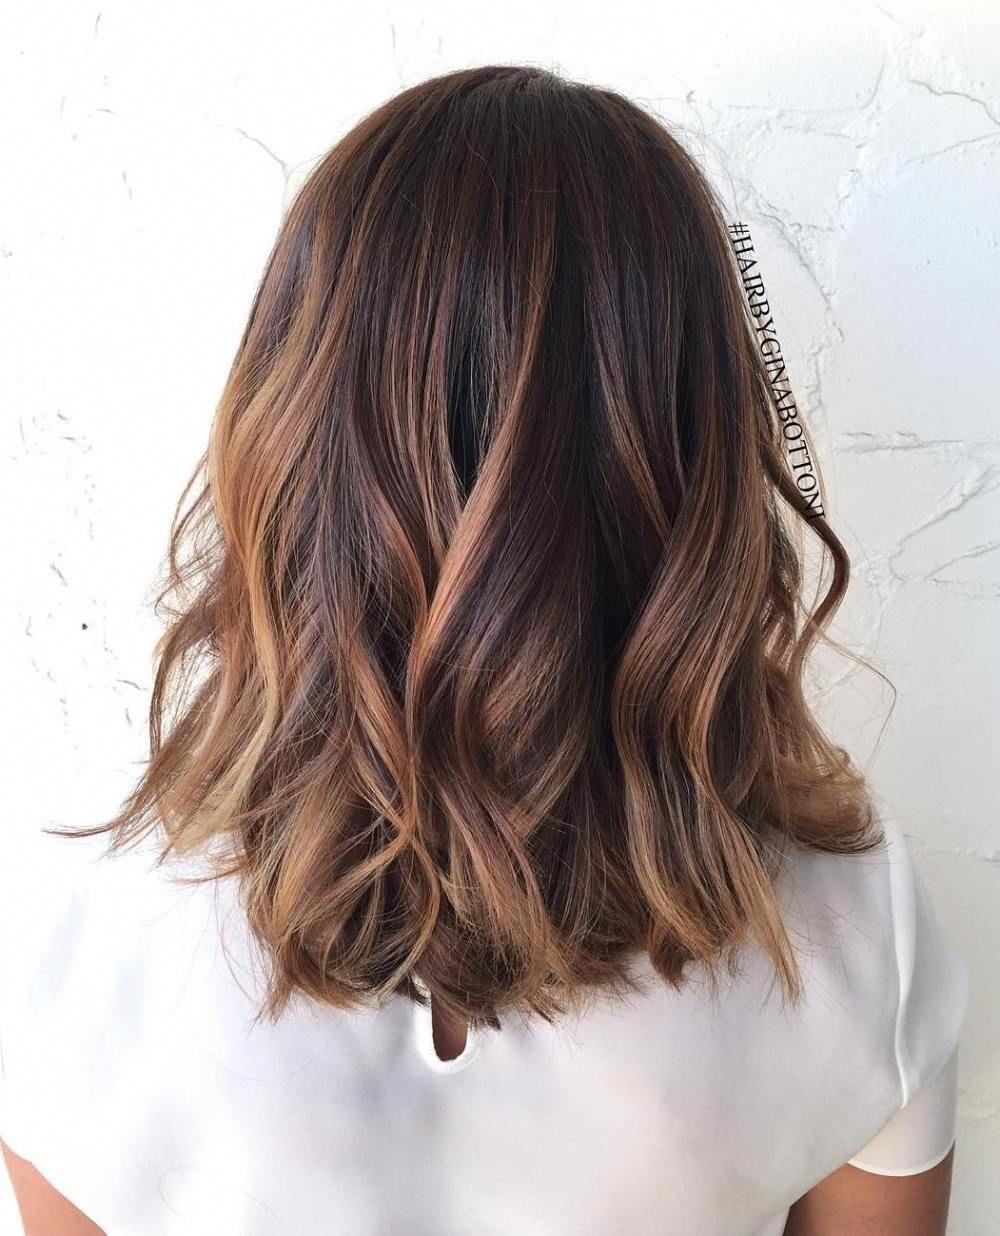 60 Chocolate Brown Hair Color Ideas for Brunettes - Diana Blog#blog #brown #brunettes #chocolate #color #diana #hair #ideas